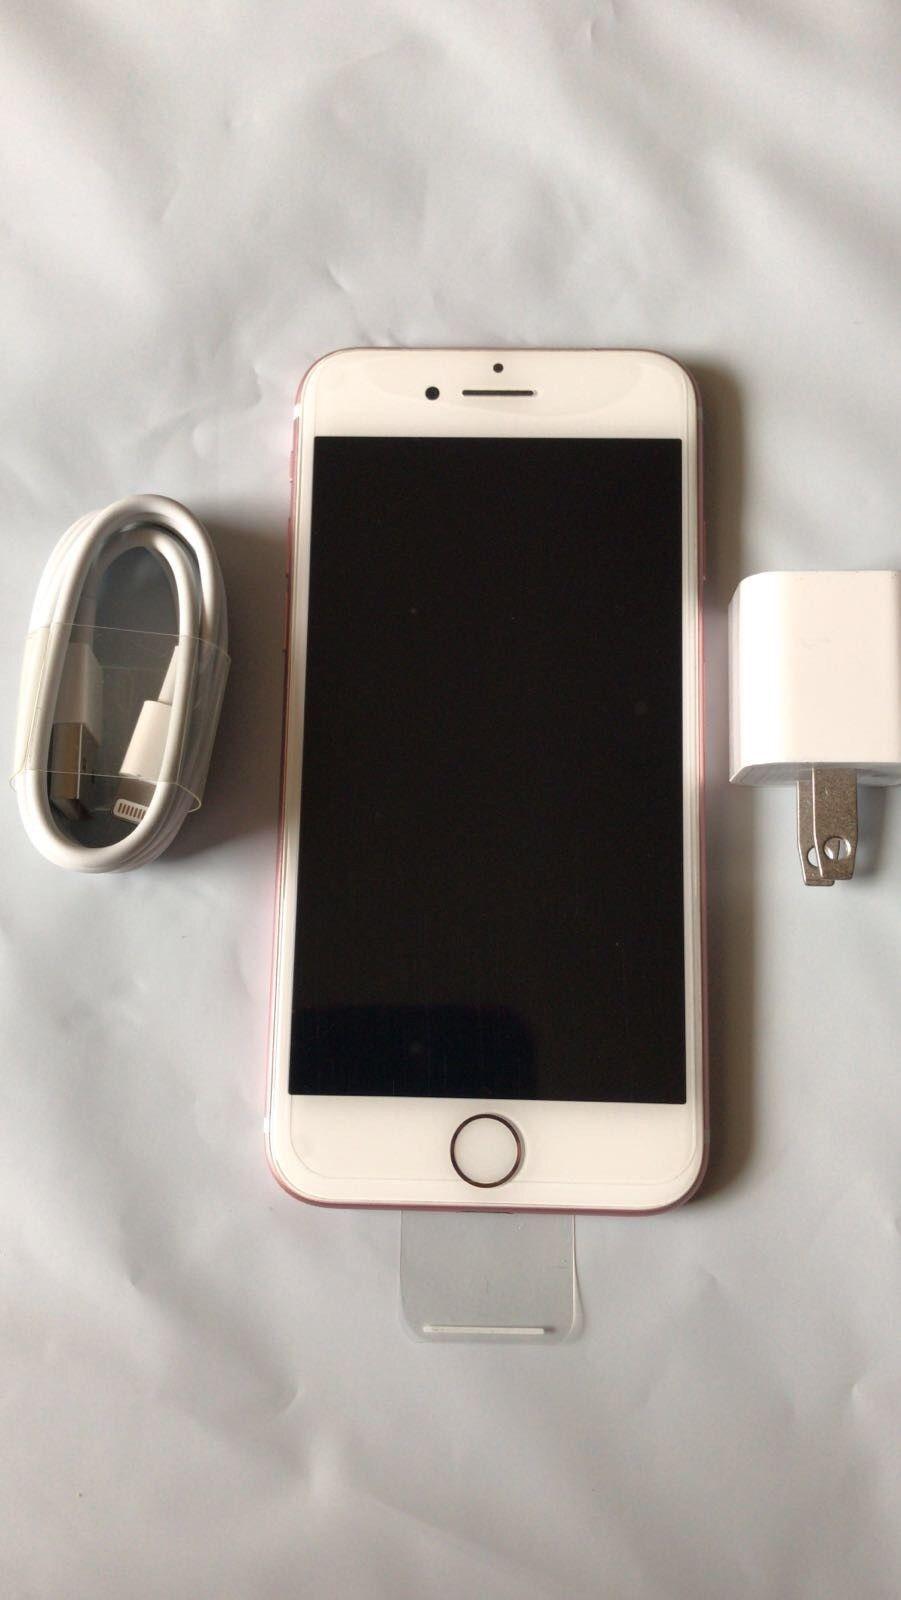 New Apple Iphone 7 128gb Rose Gold Verizon Factory Unlocked Plus Jet Black Garansi Internasional Open